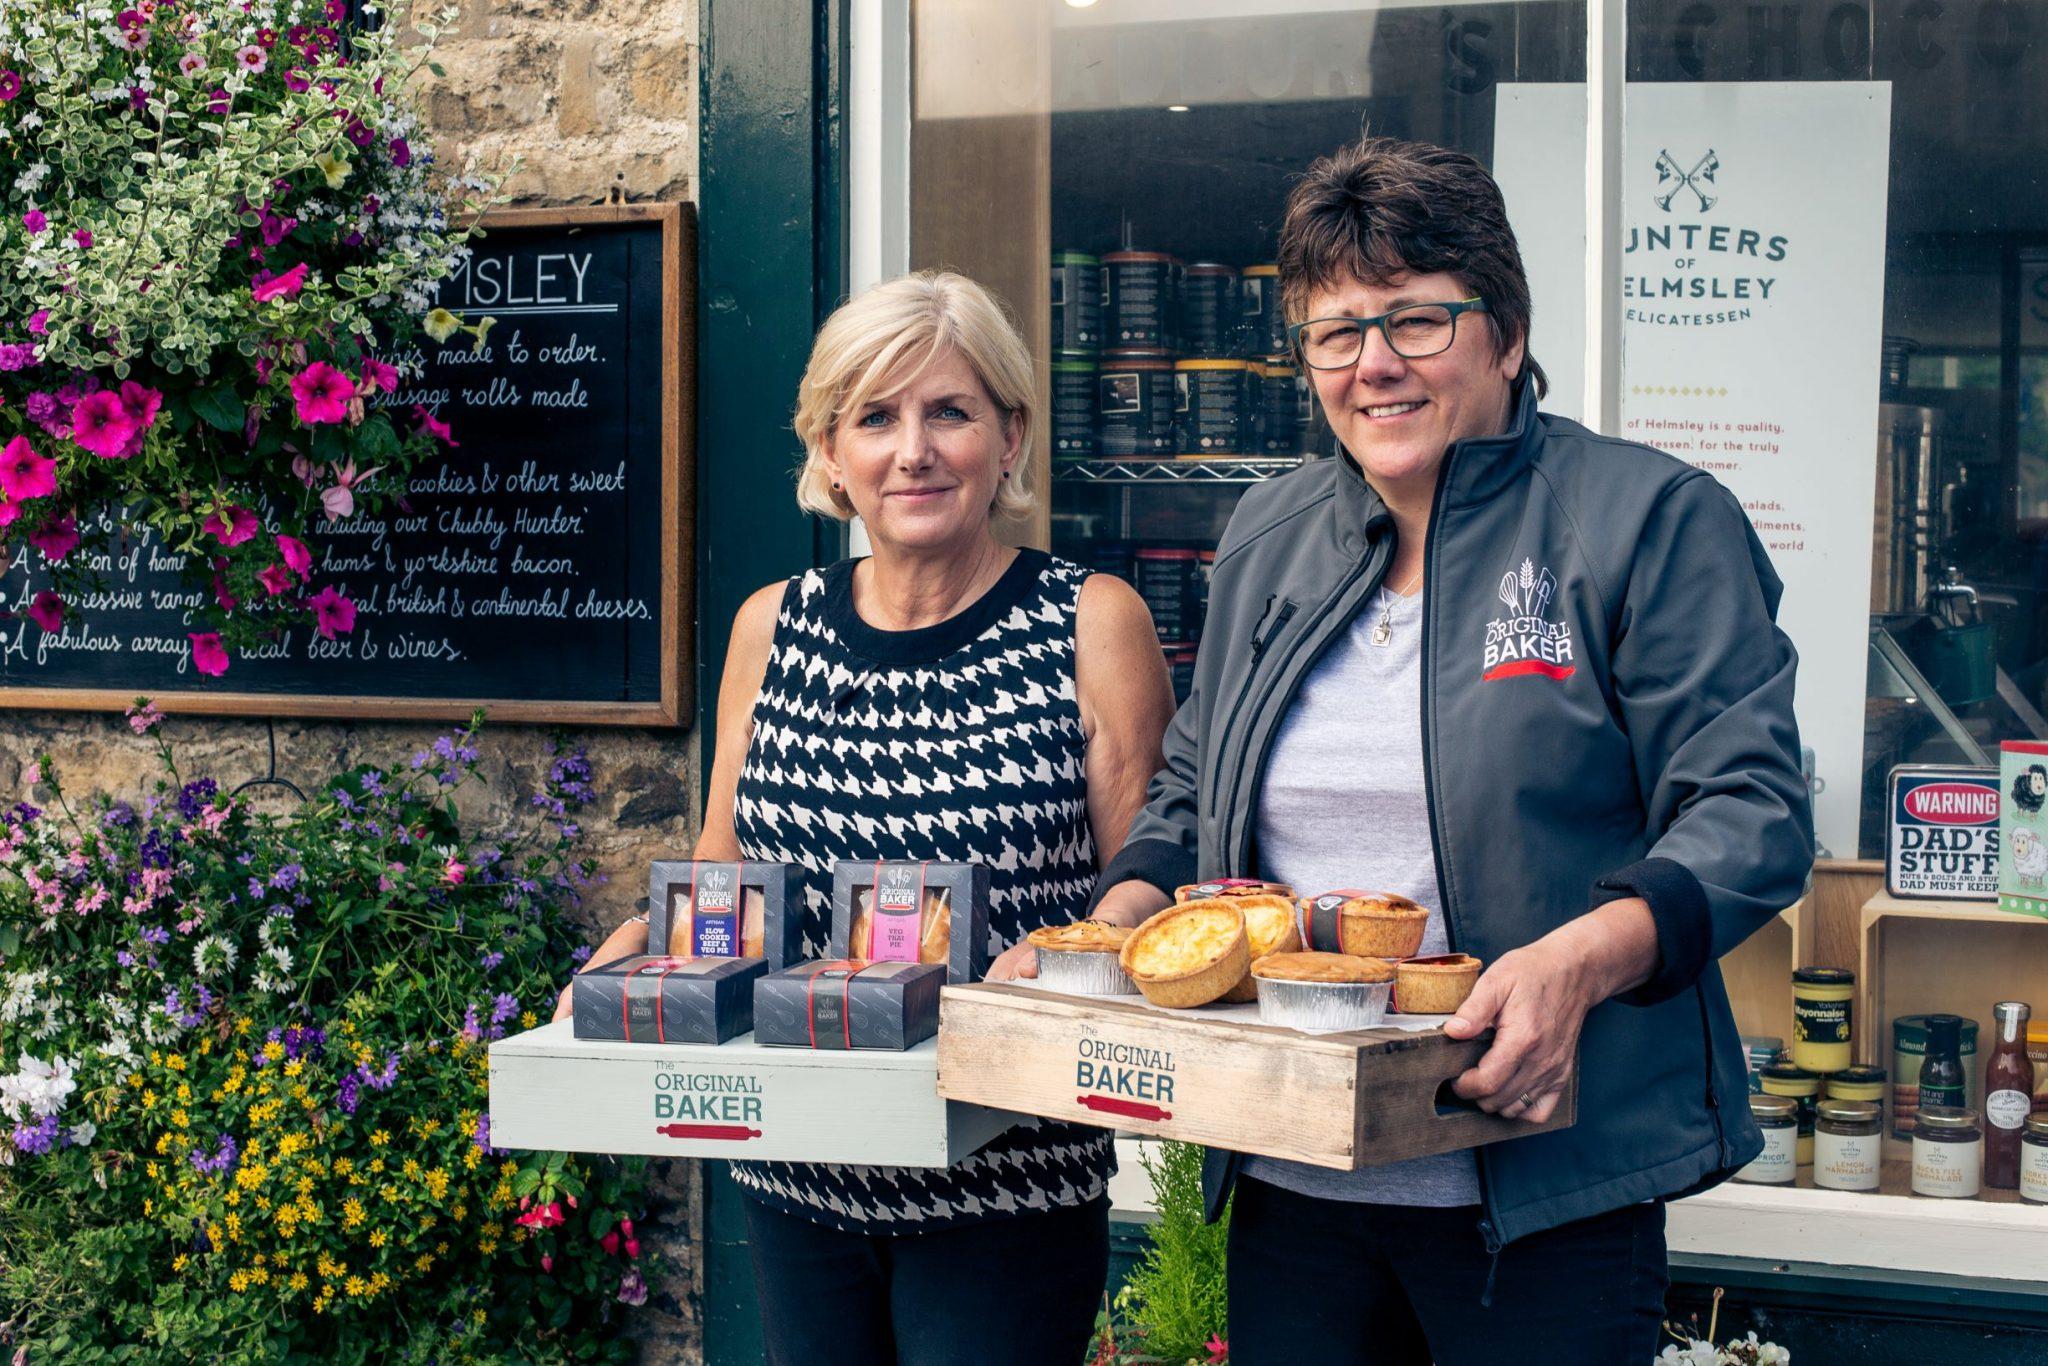 Christine Garnett of Hunters of Helmsley and Gill Ridgard of The Original Baker, with the new gluten free range